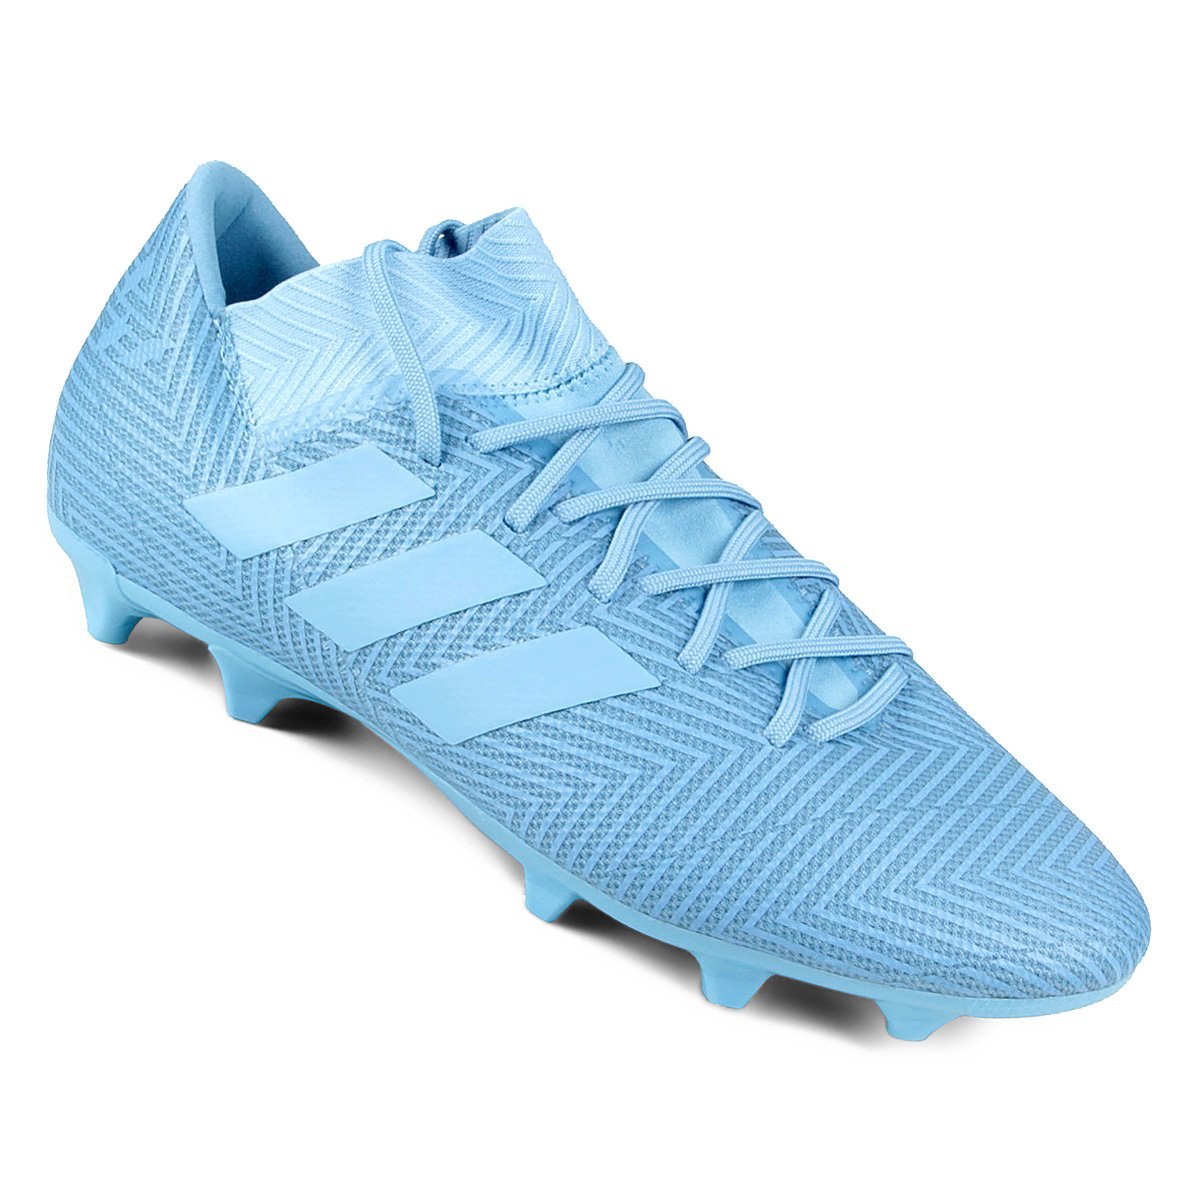 da37e91763 Chuteira Campo Adidas Nemeziz Messi 18 3 FG - Compre Agora